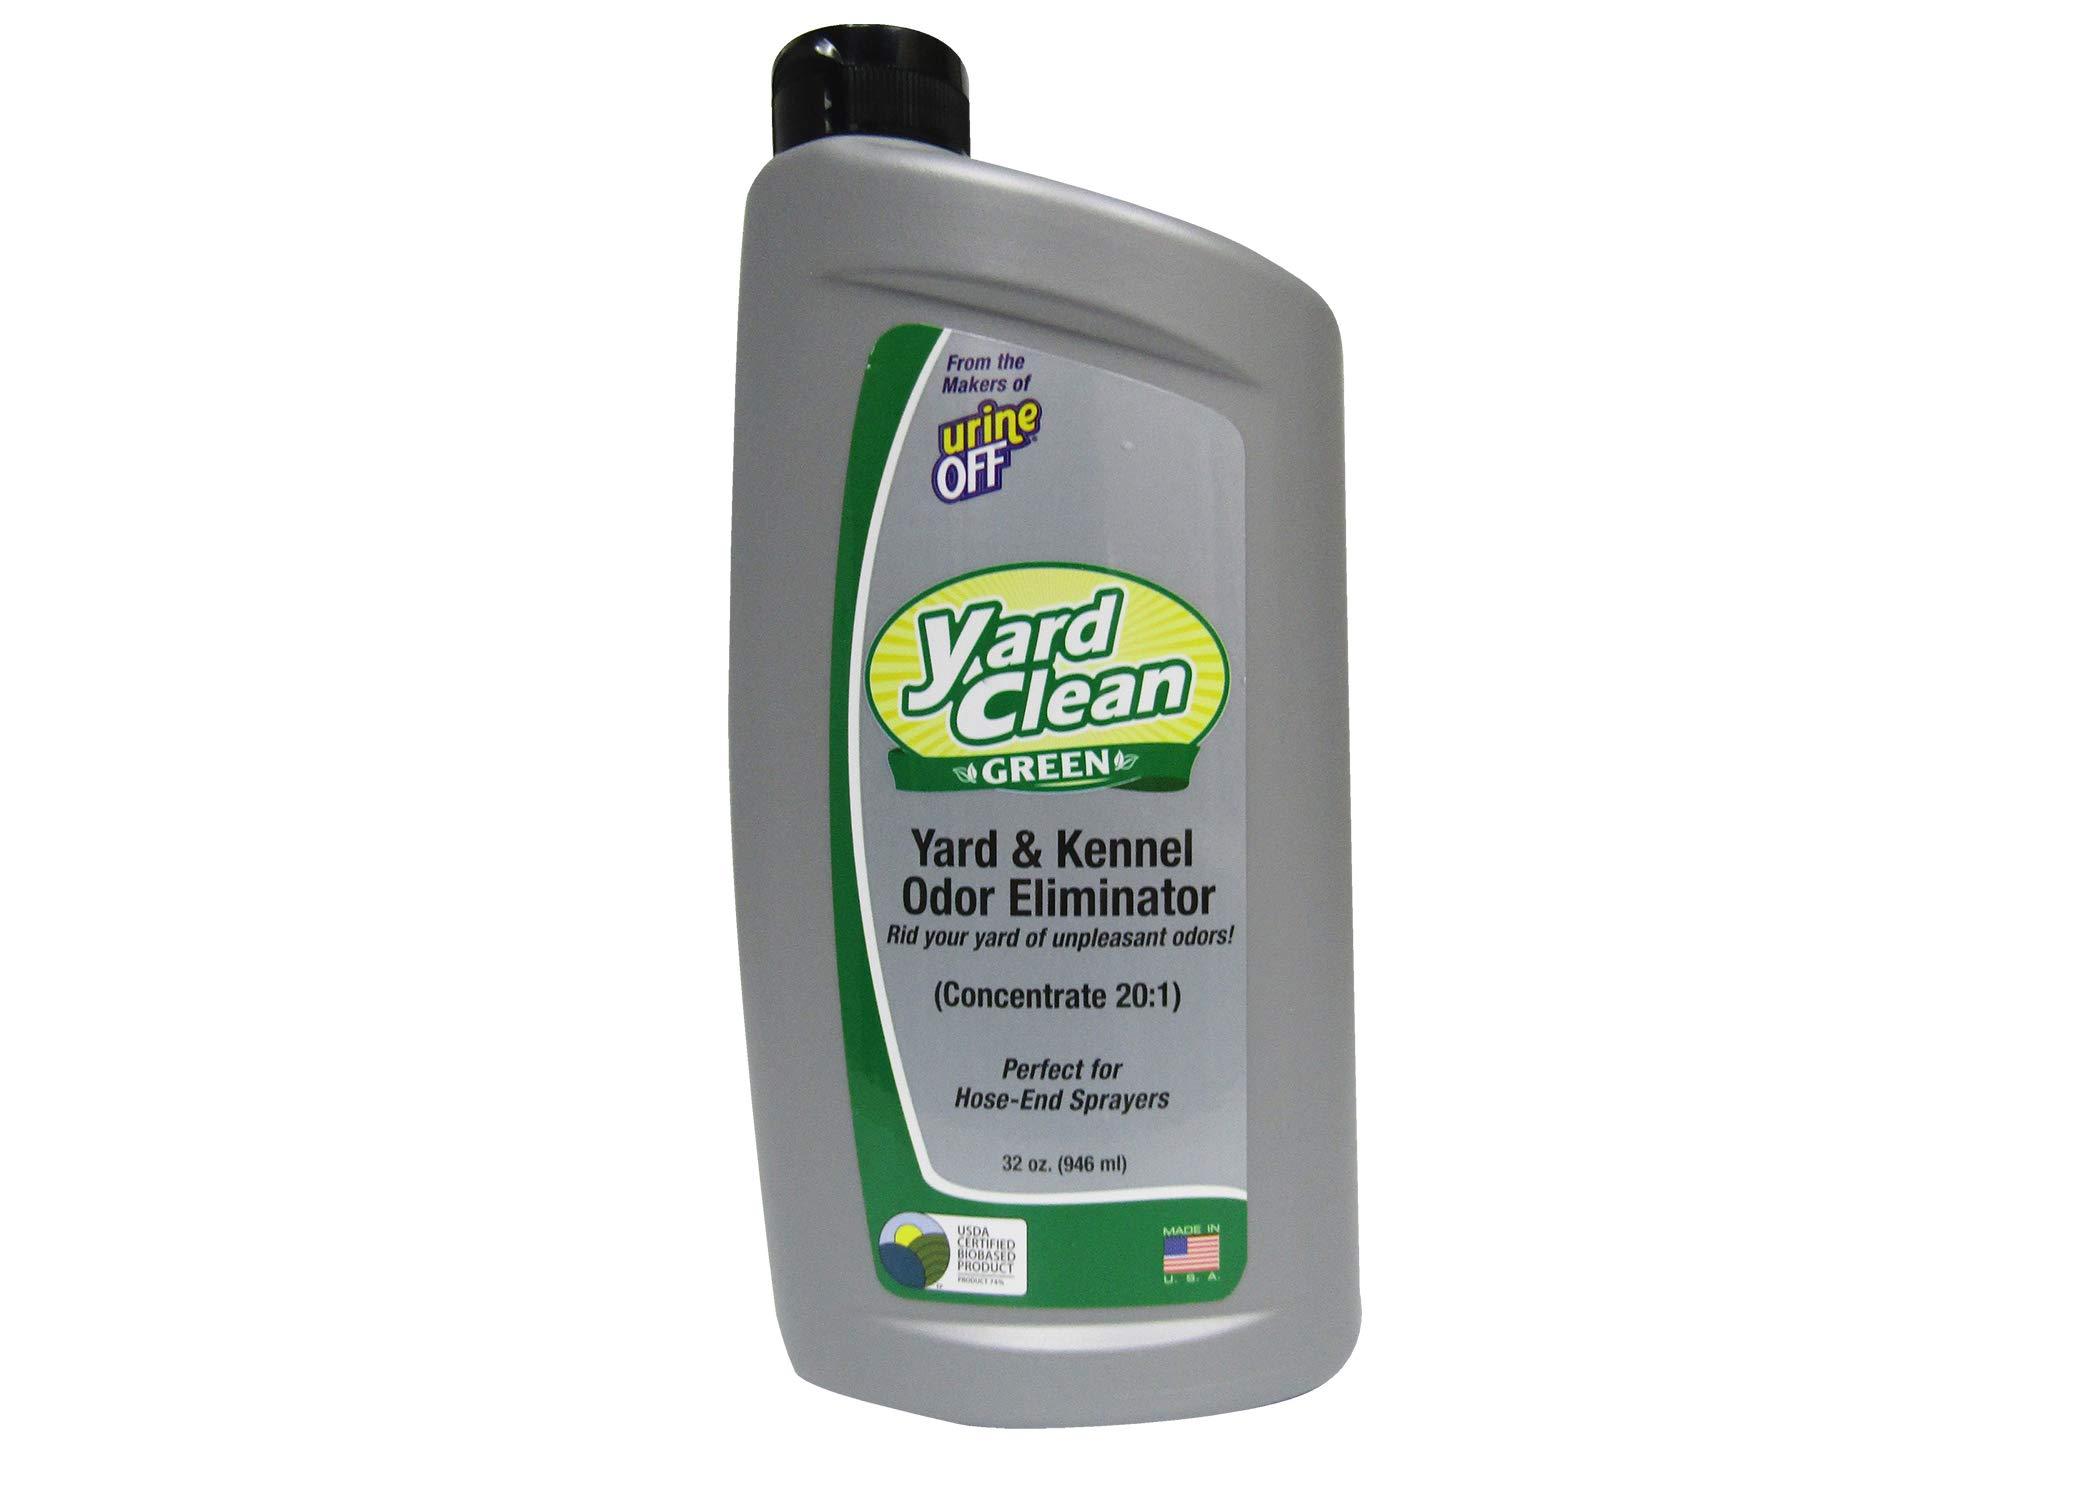 Urine Off BU1027 32 oz 20:1 Concentrate Clean Green(TM) Yard and Kenner Odor Eliminator